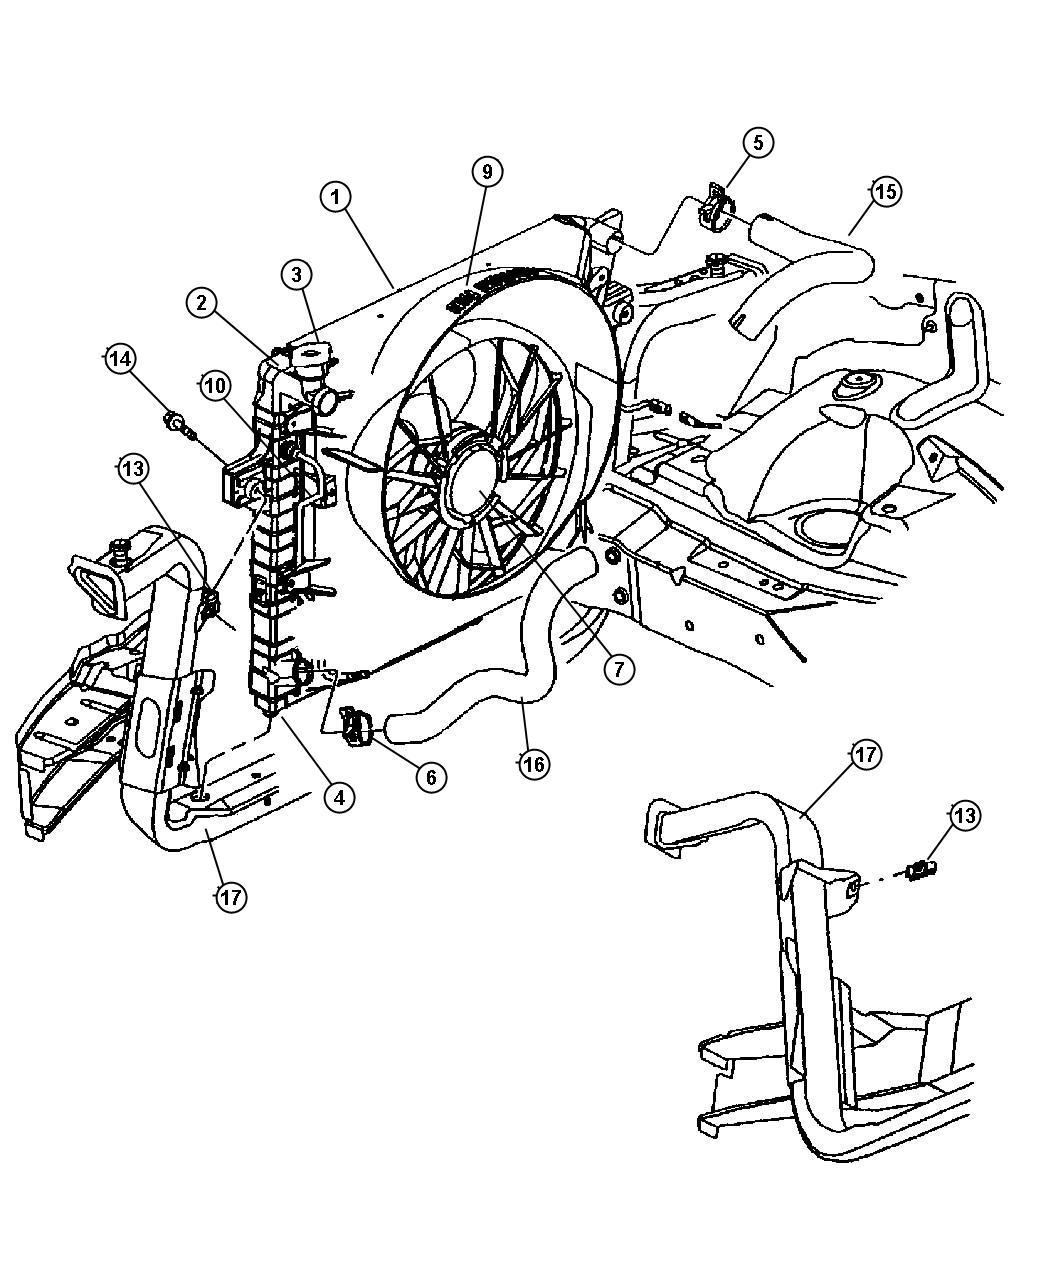 Jeep Grand Cherokee Radiator Engine Cooling Export